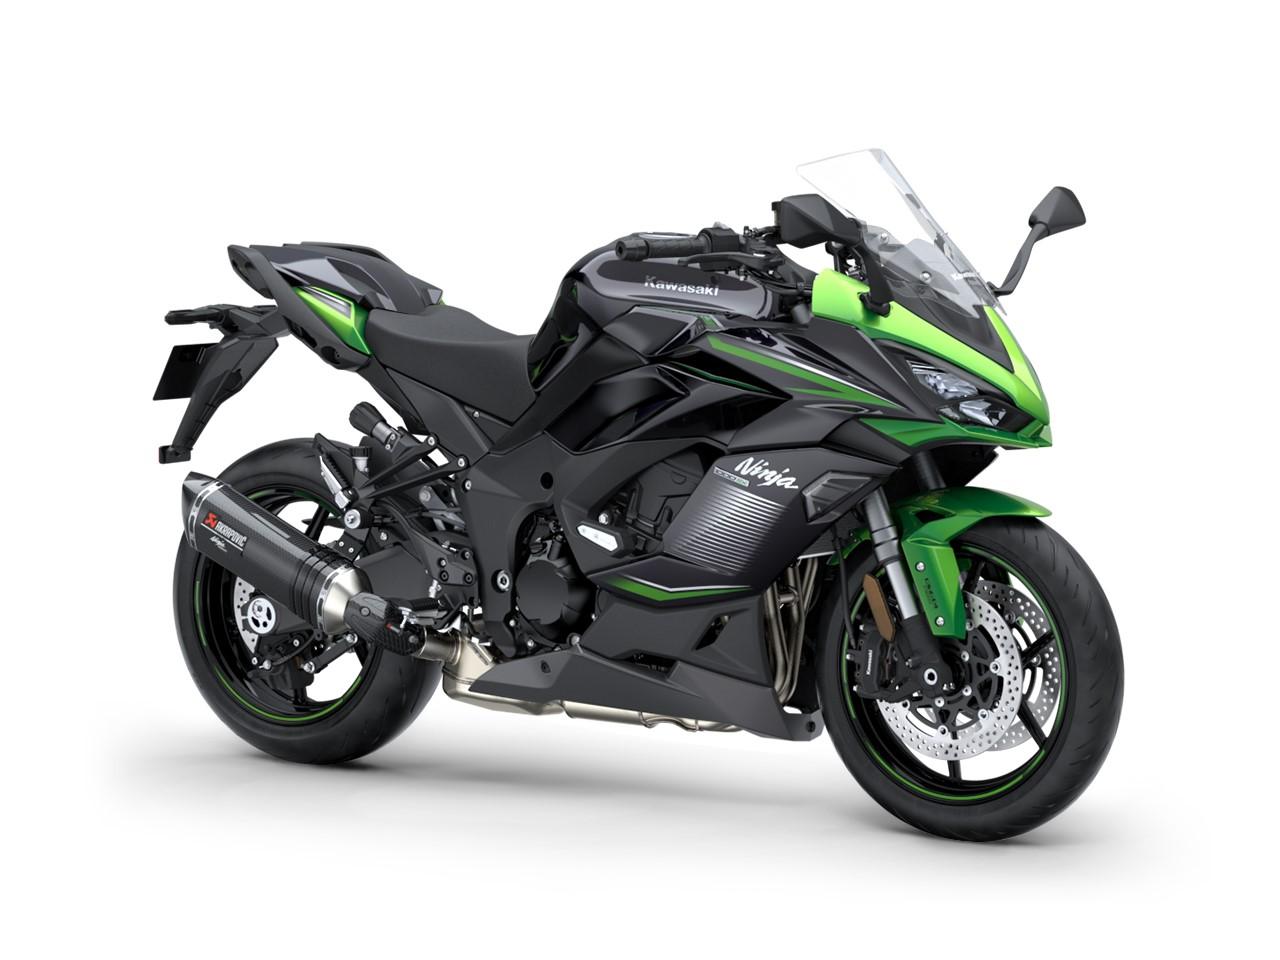 Ninja 1000SX